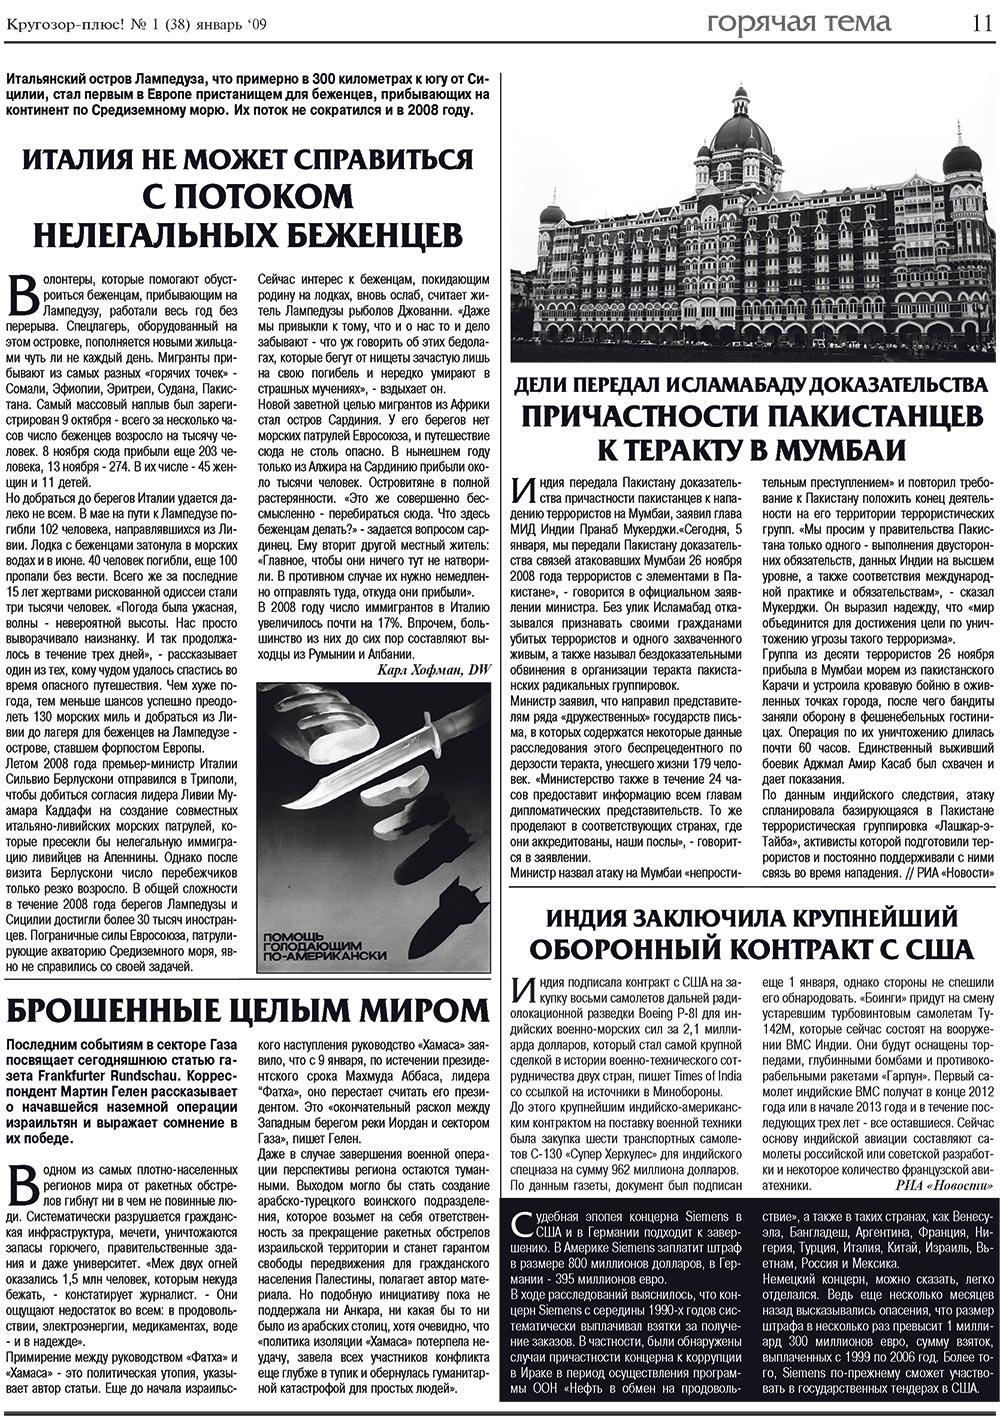 Кругозор плюс! (газета). 2009 год, номер 1, стр. 11